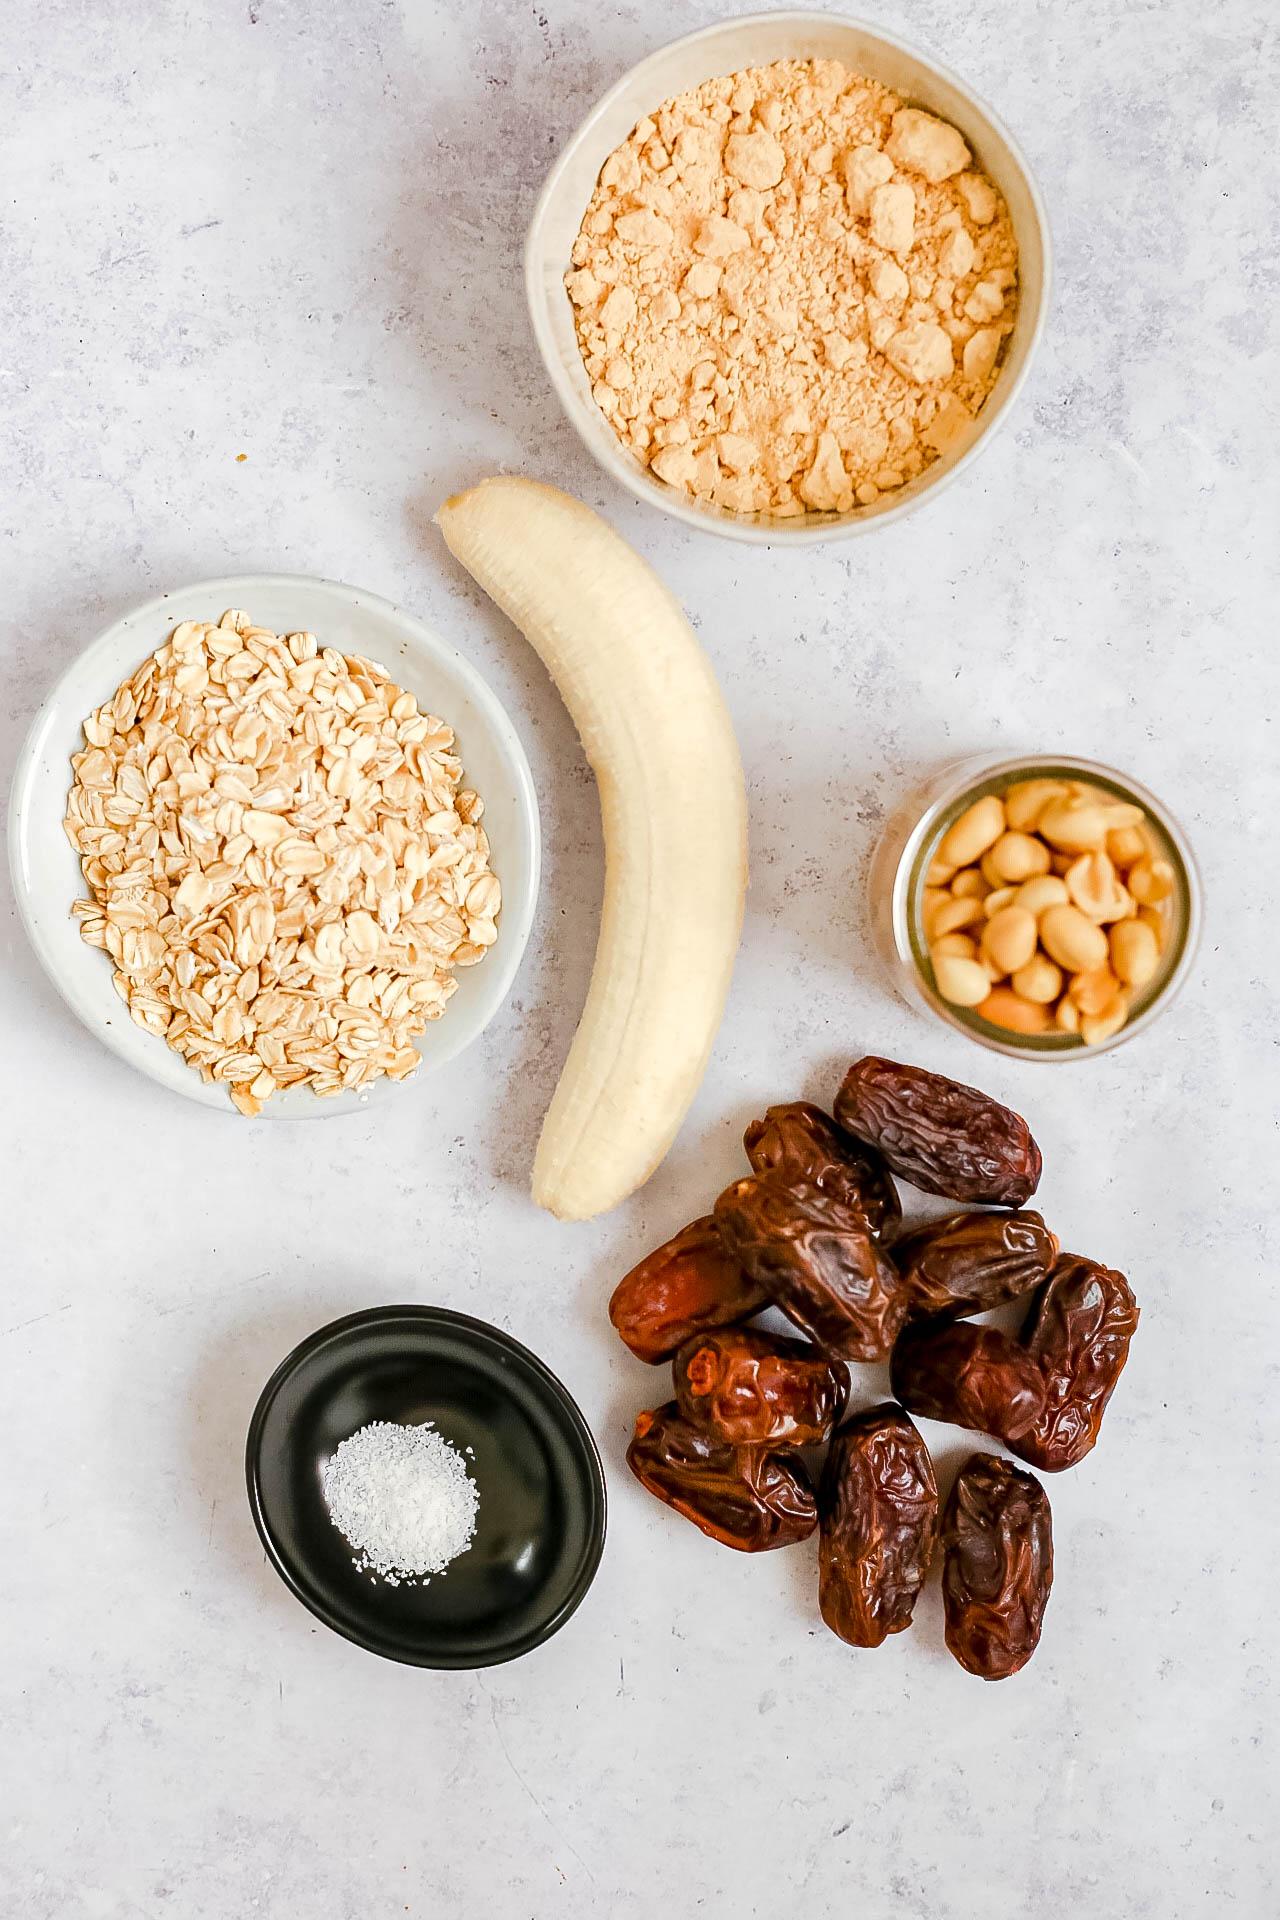 Peanut Butter Banana Breakfast Bars Ingredients